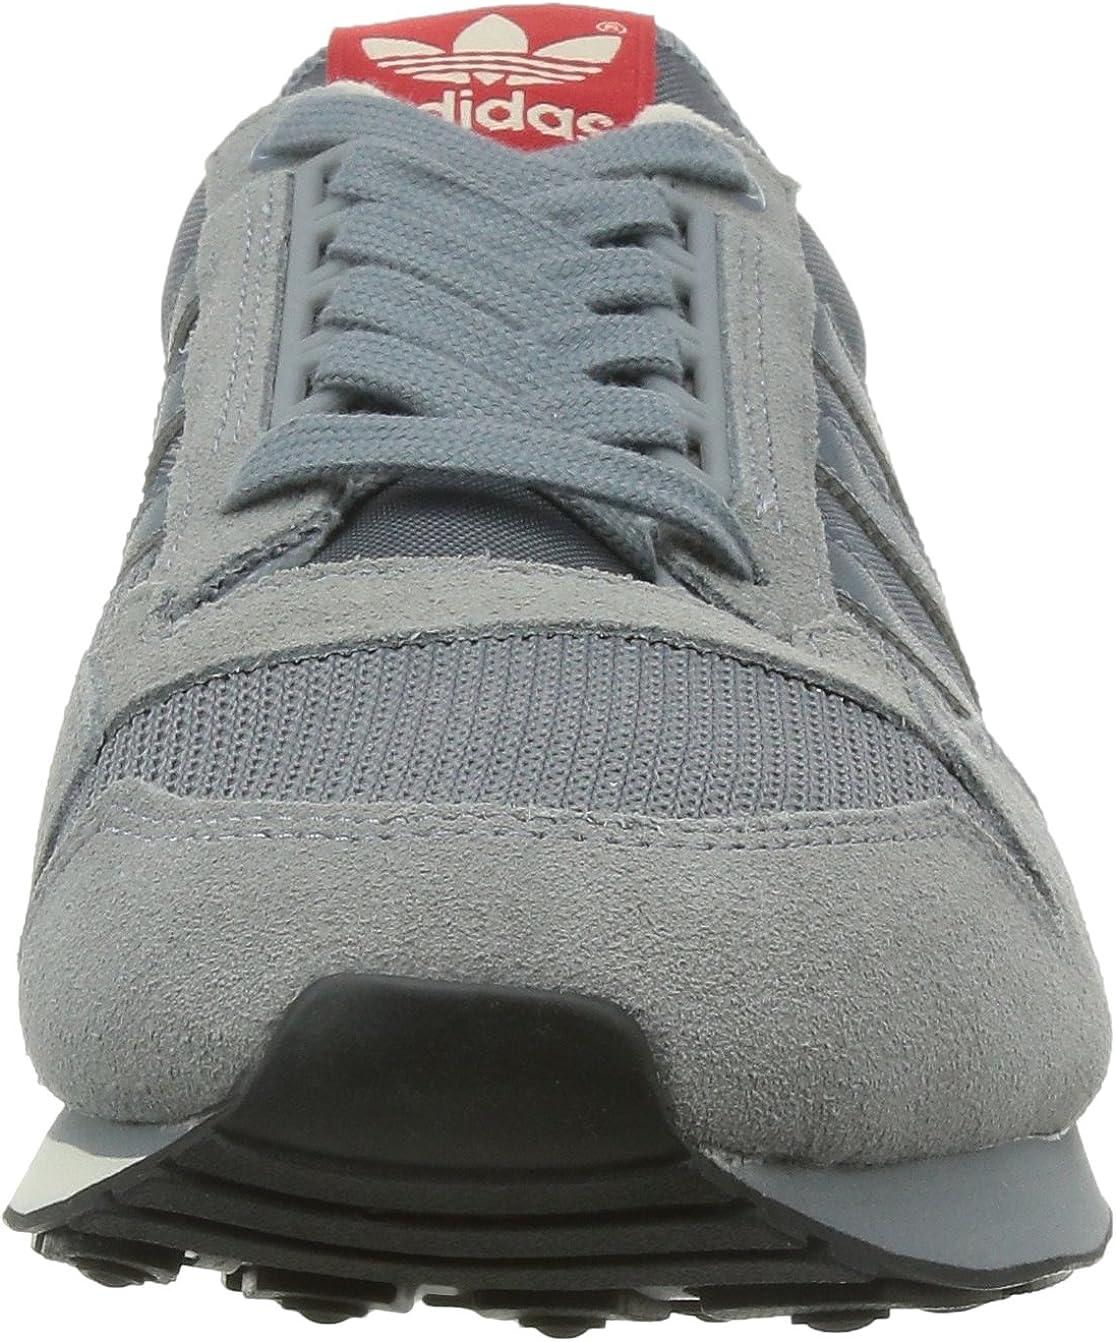 adidas ZX 500 OG, Baskets Basses Homme, Gris Grau (Grey